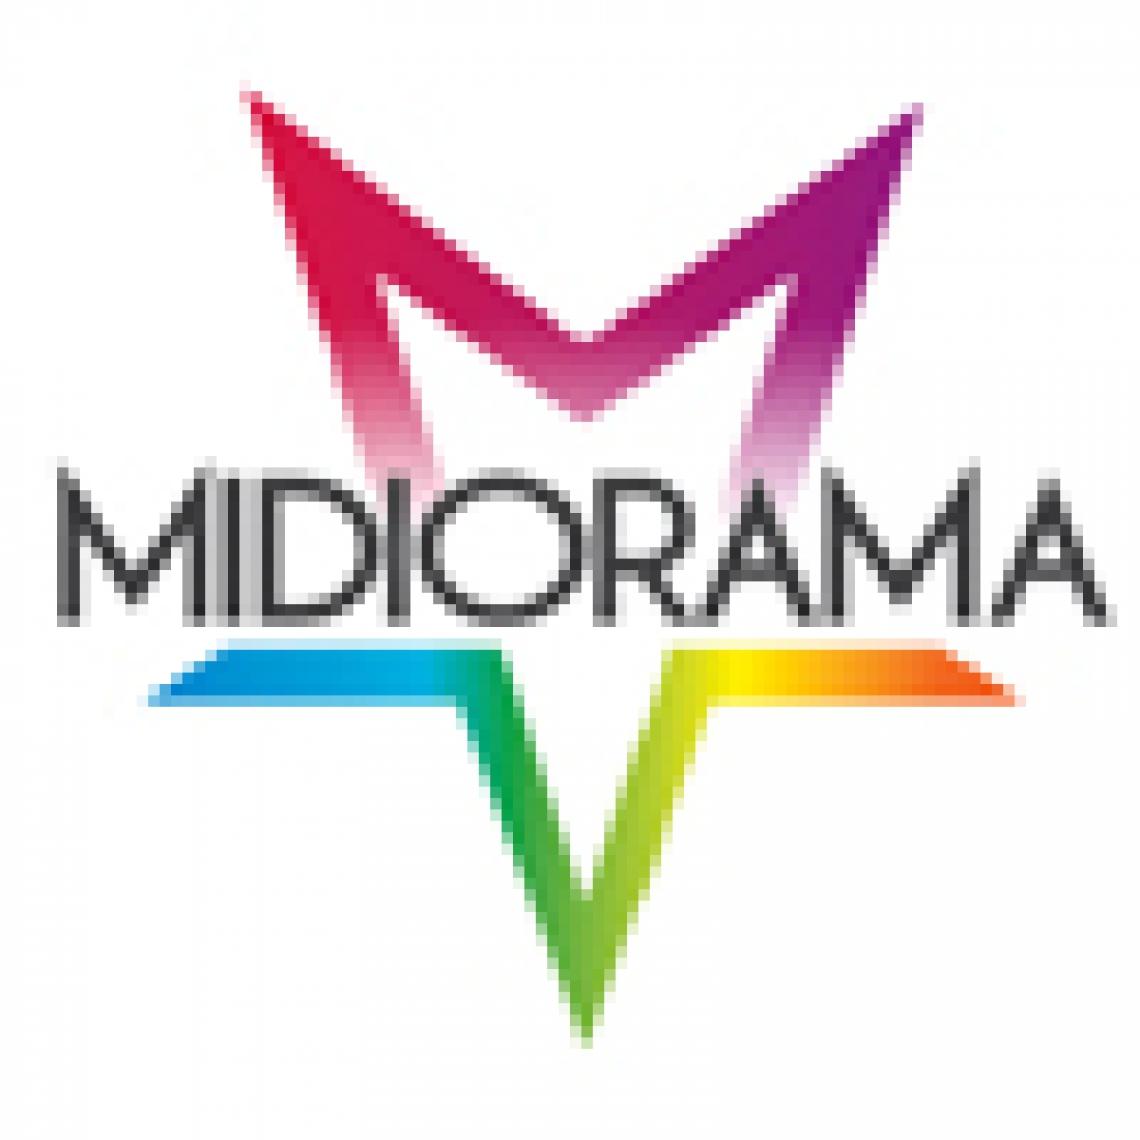 Midiorama